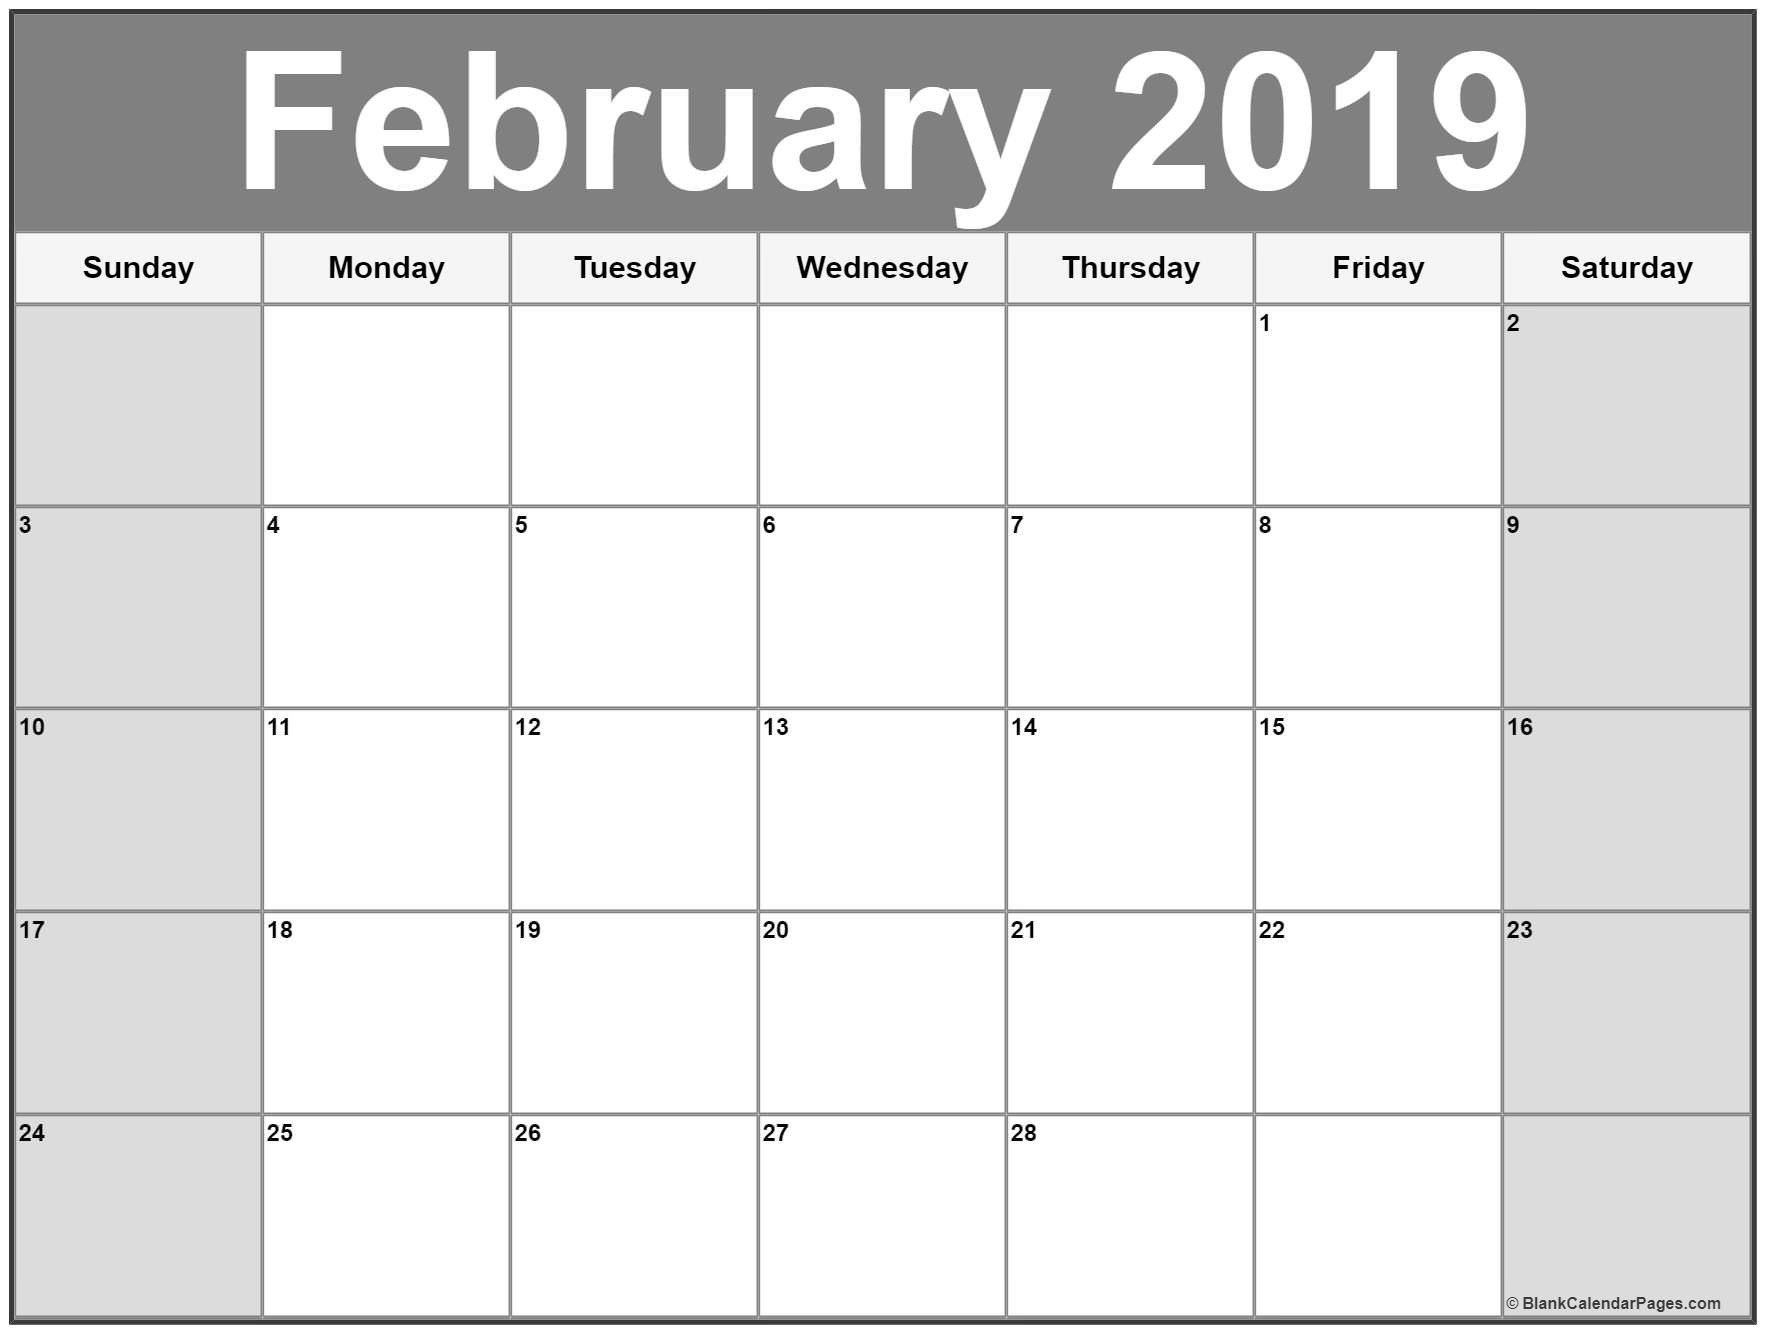 Feb 2019 Calendar Printable February 2019 Calendar